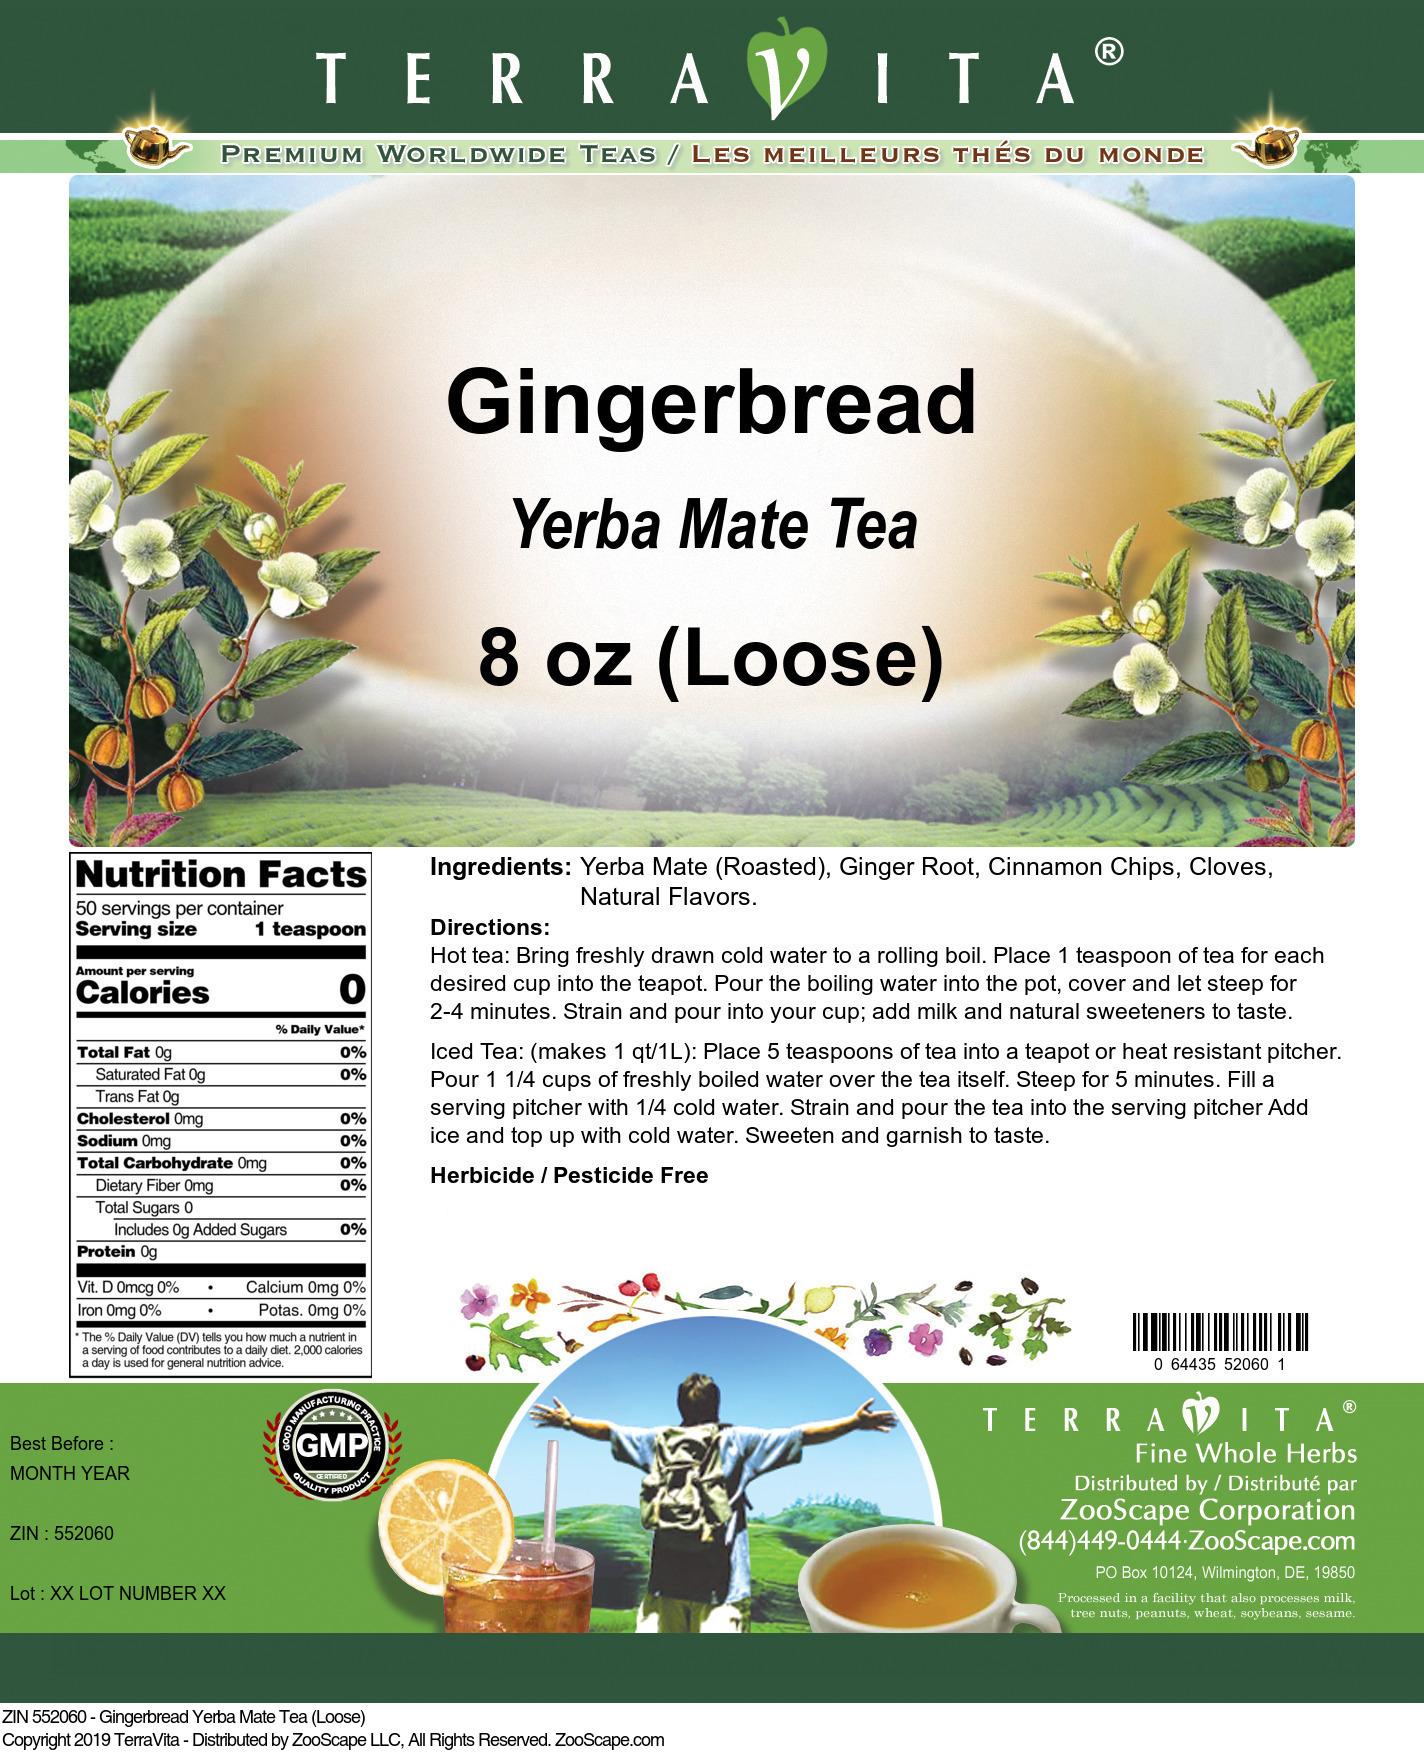 Gingerbread Yerba Mate Tea (Loose)